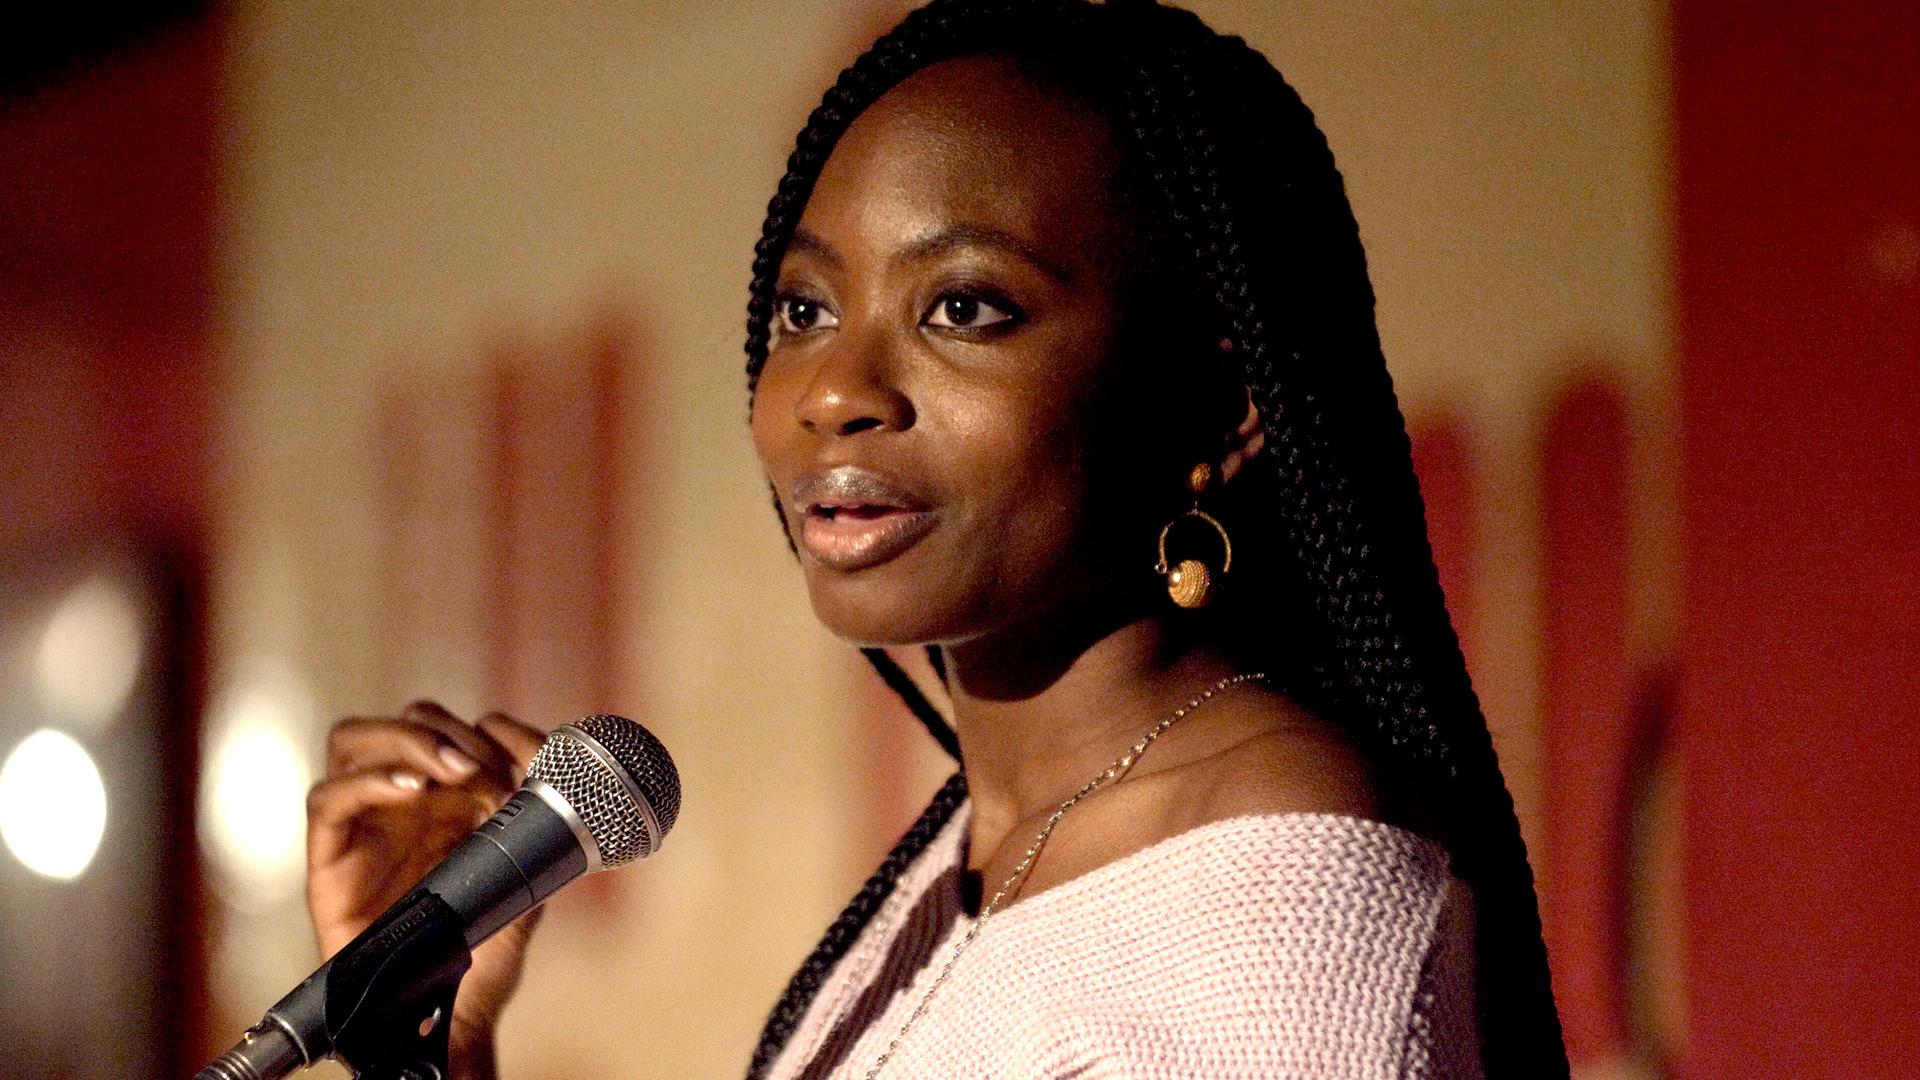 Spoken word artist Angola, performing at Club 100